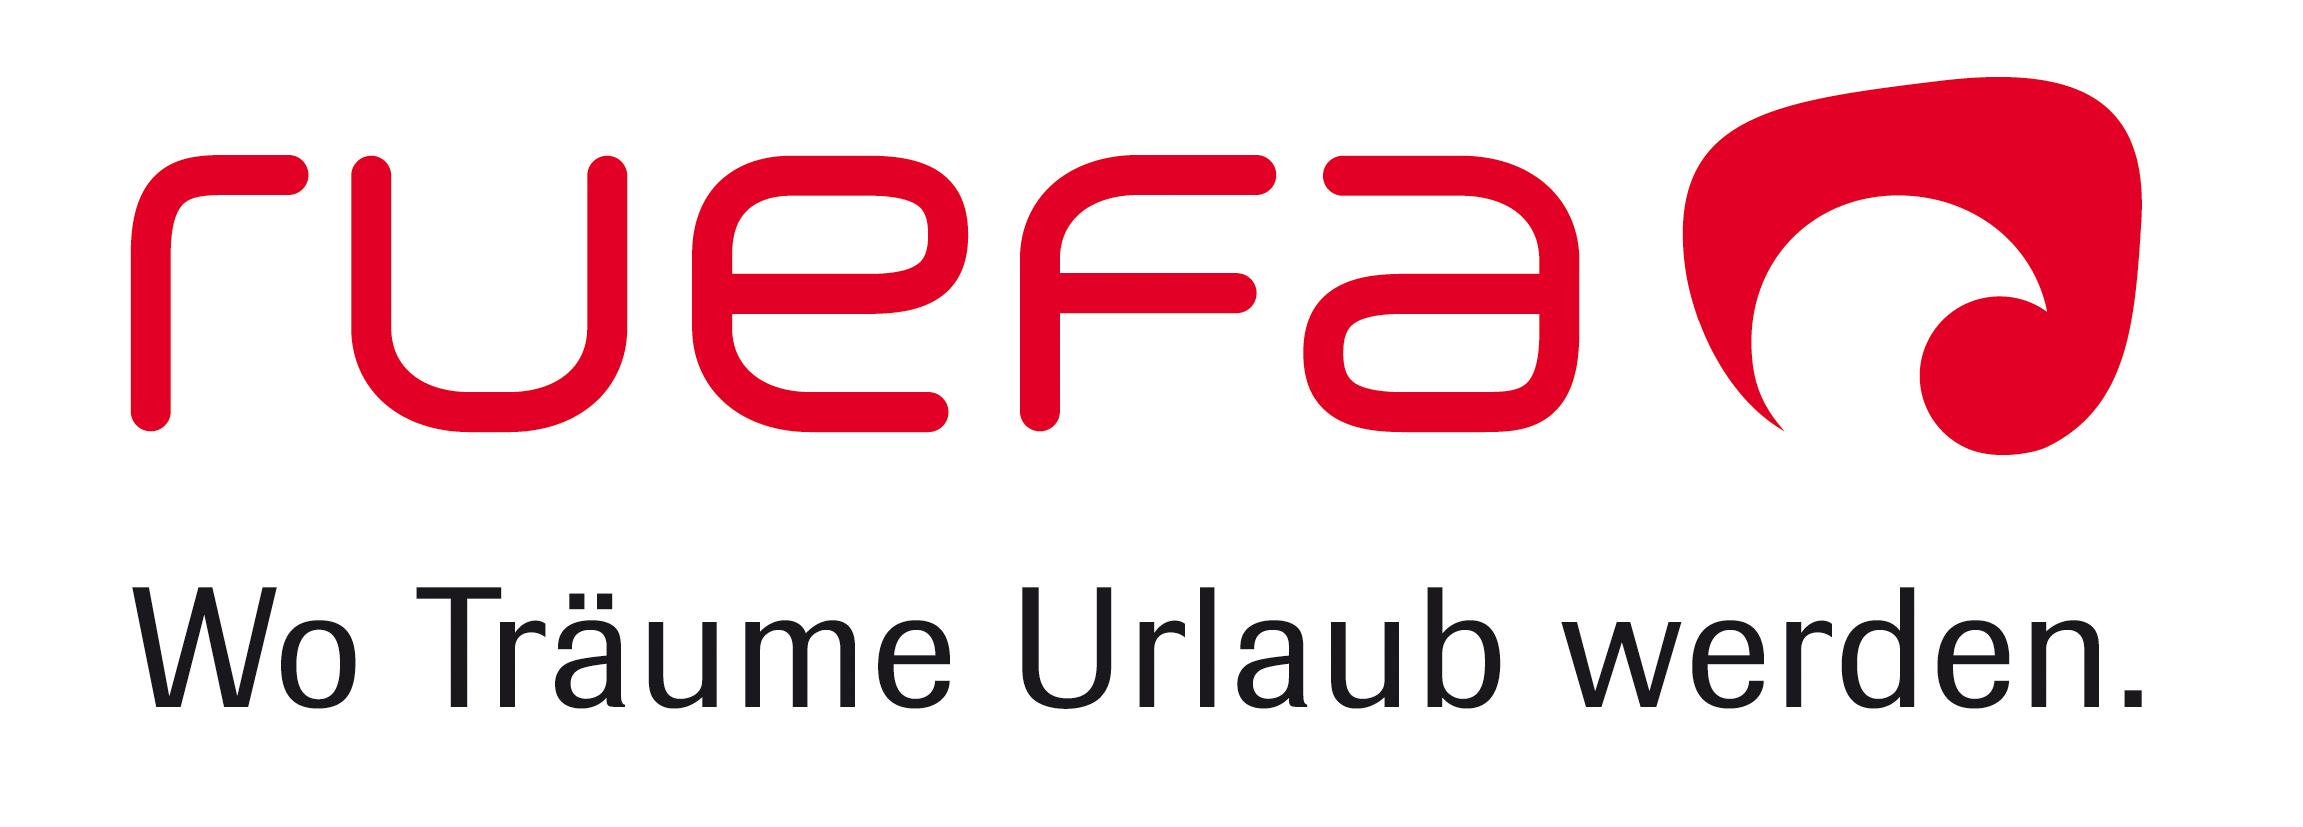 R_Logo_Ruefa_Slogan_rg#B1844.jpg